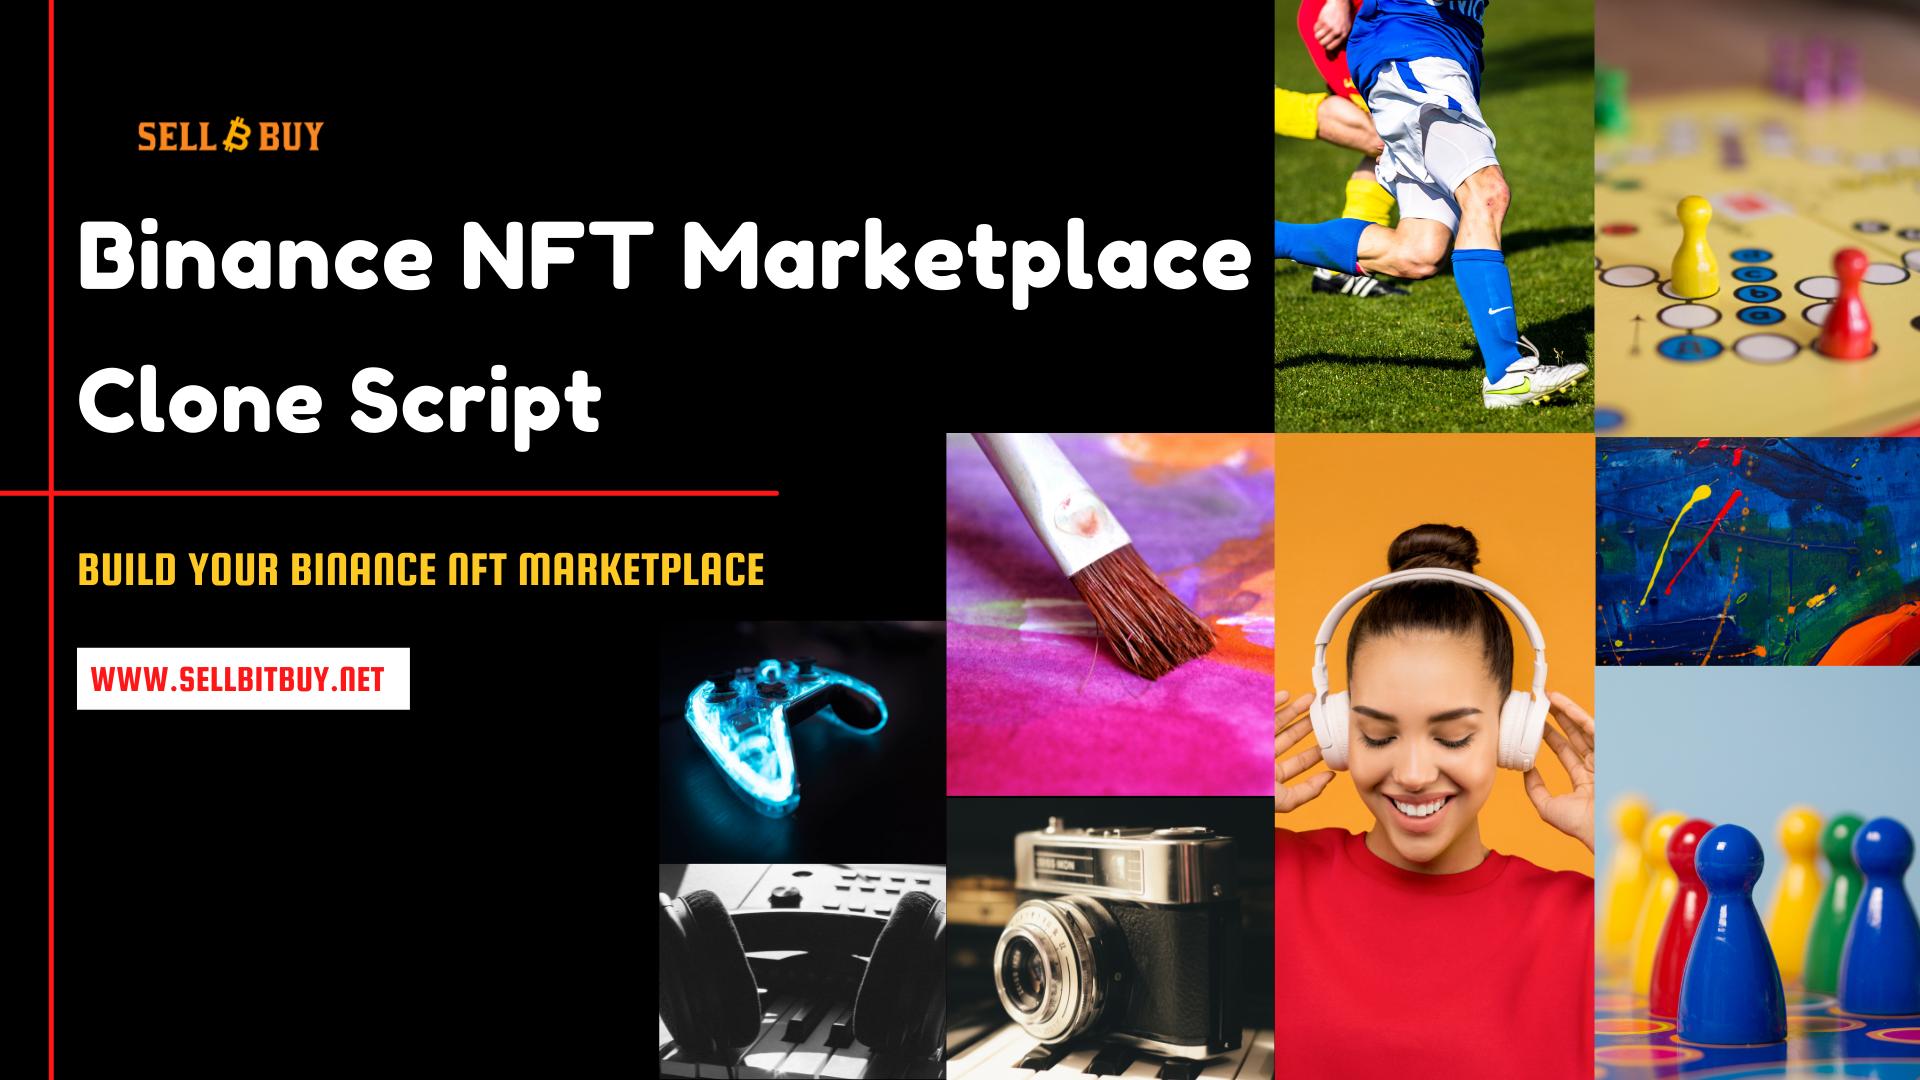 Binance NFT Clone Script - To Launch A P2P NFT Marketplace Like Binance NFT